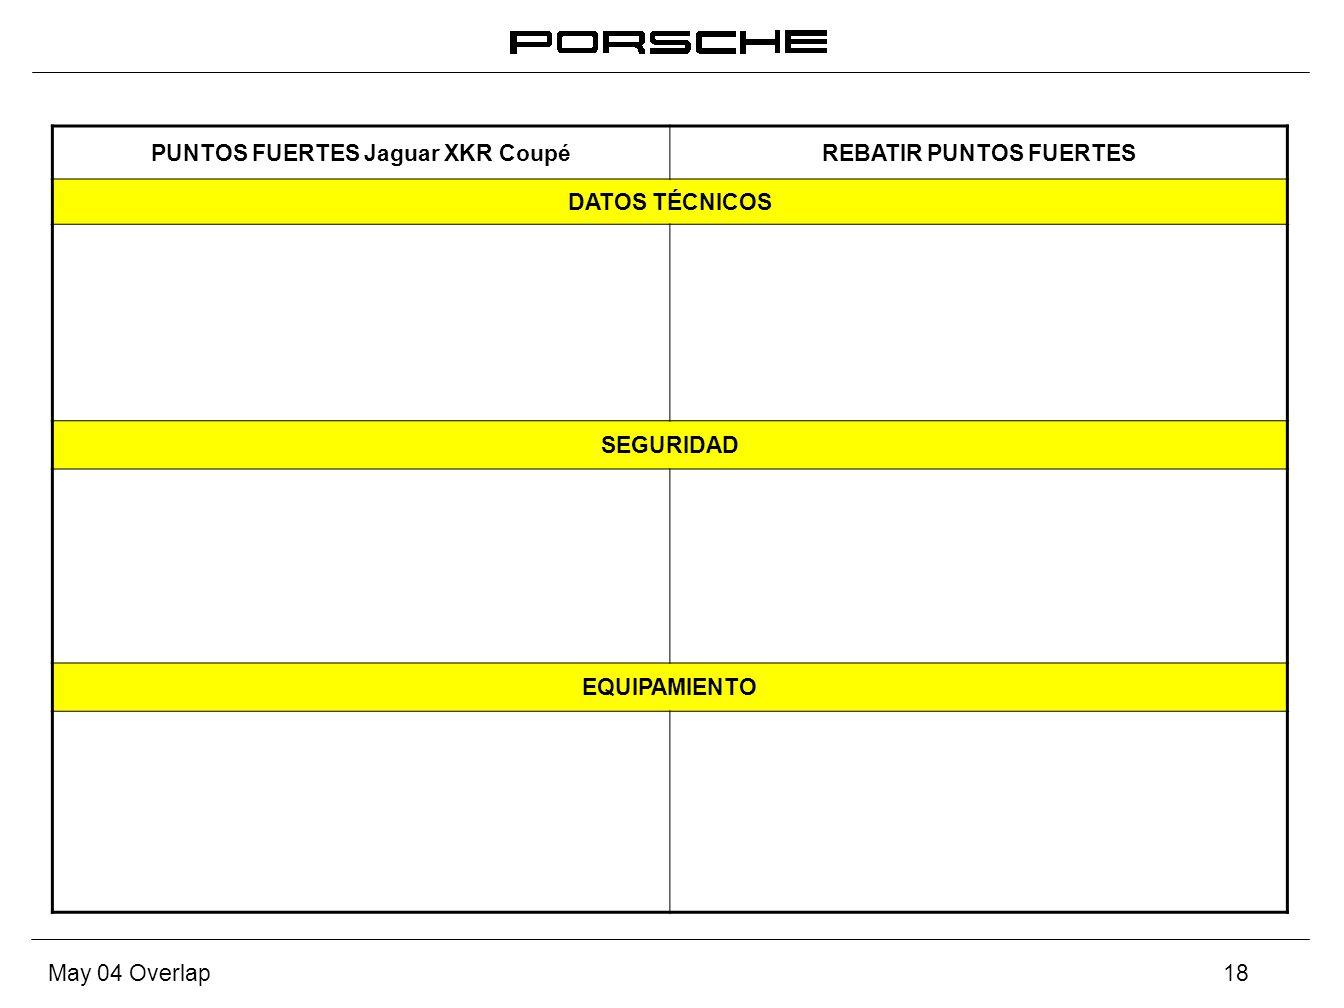 PUNTOS FUERTES Porsche 911 Carrera (MY´05) BMW 645 DATOS TÉCNICOS